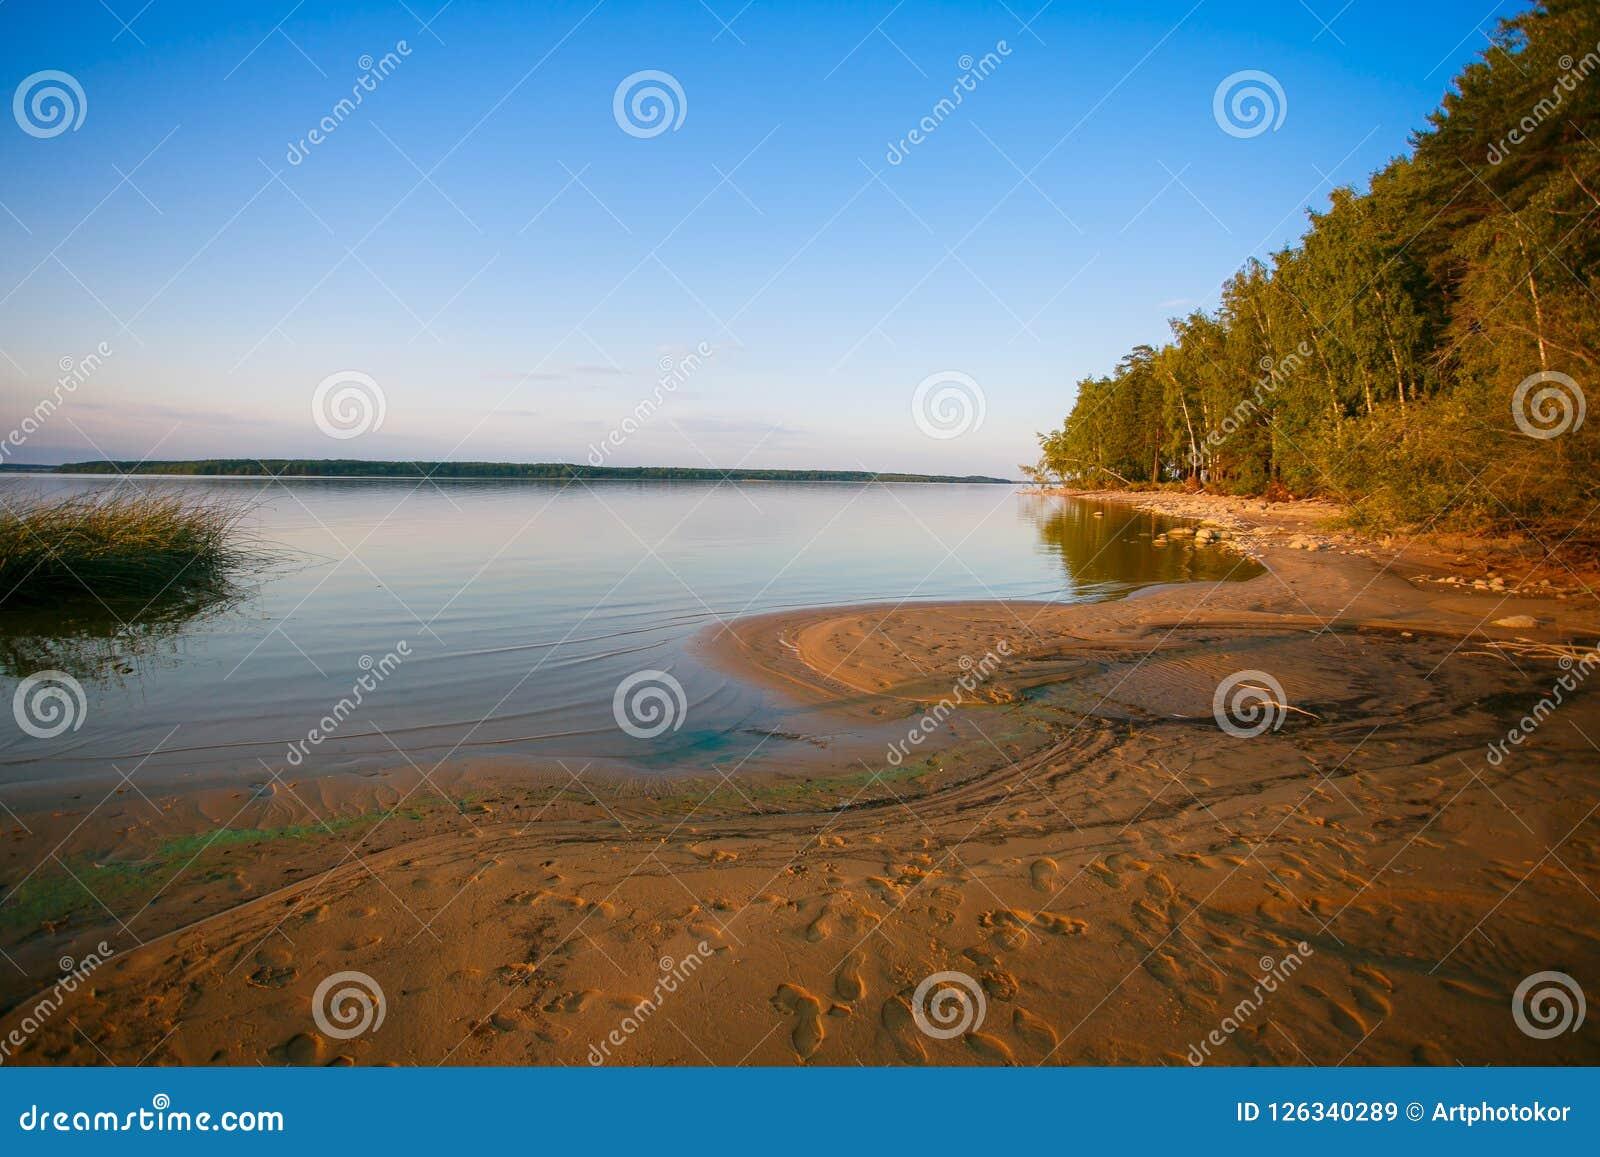 Orilla del lago que afila el paisaje mezclado del bosque, Bielorrusia